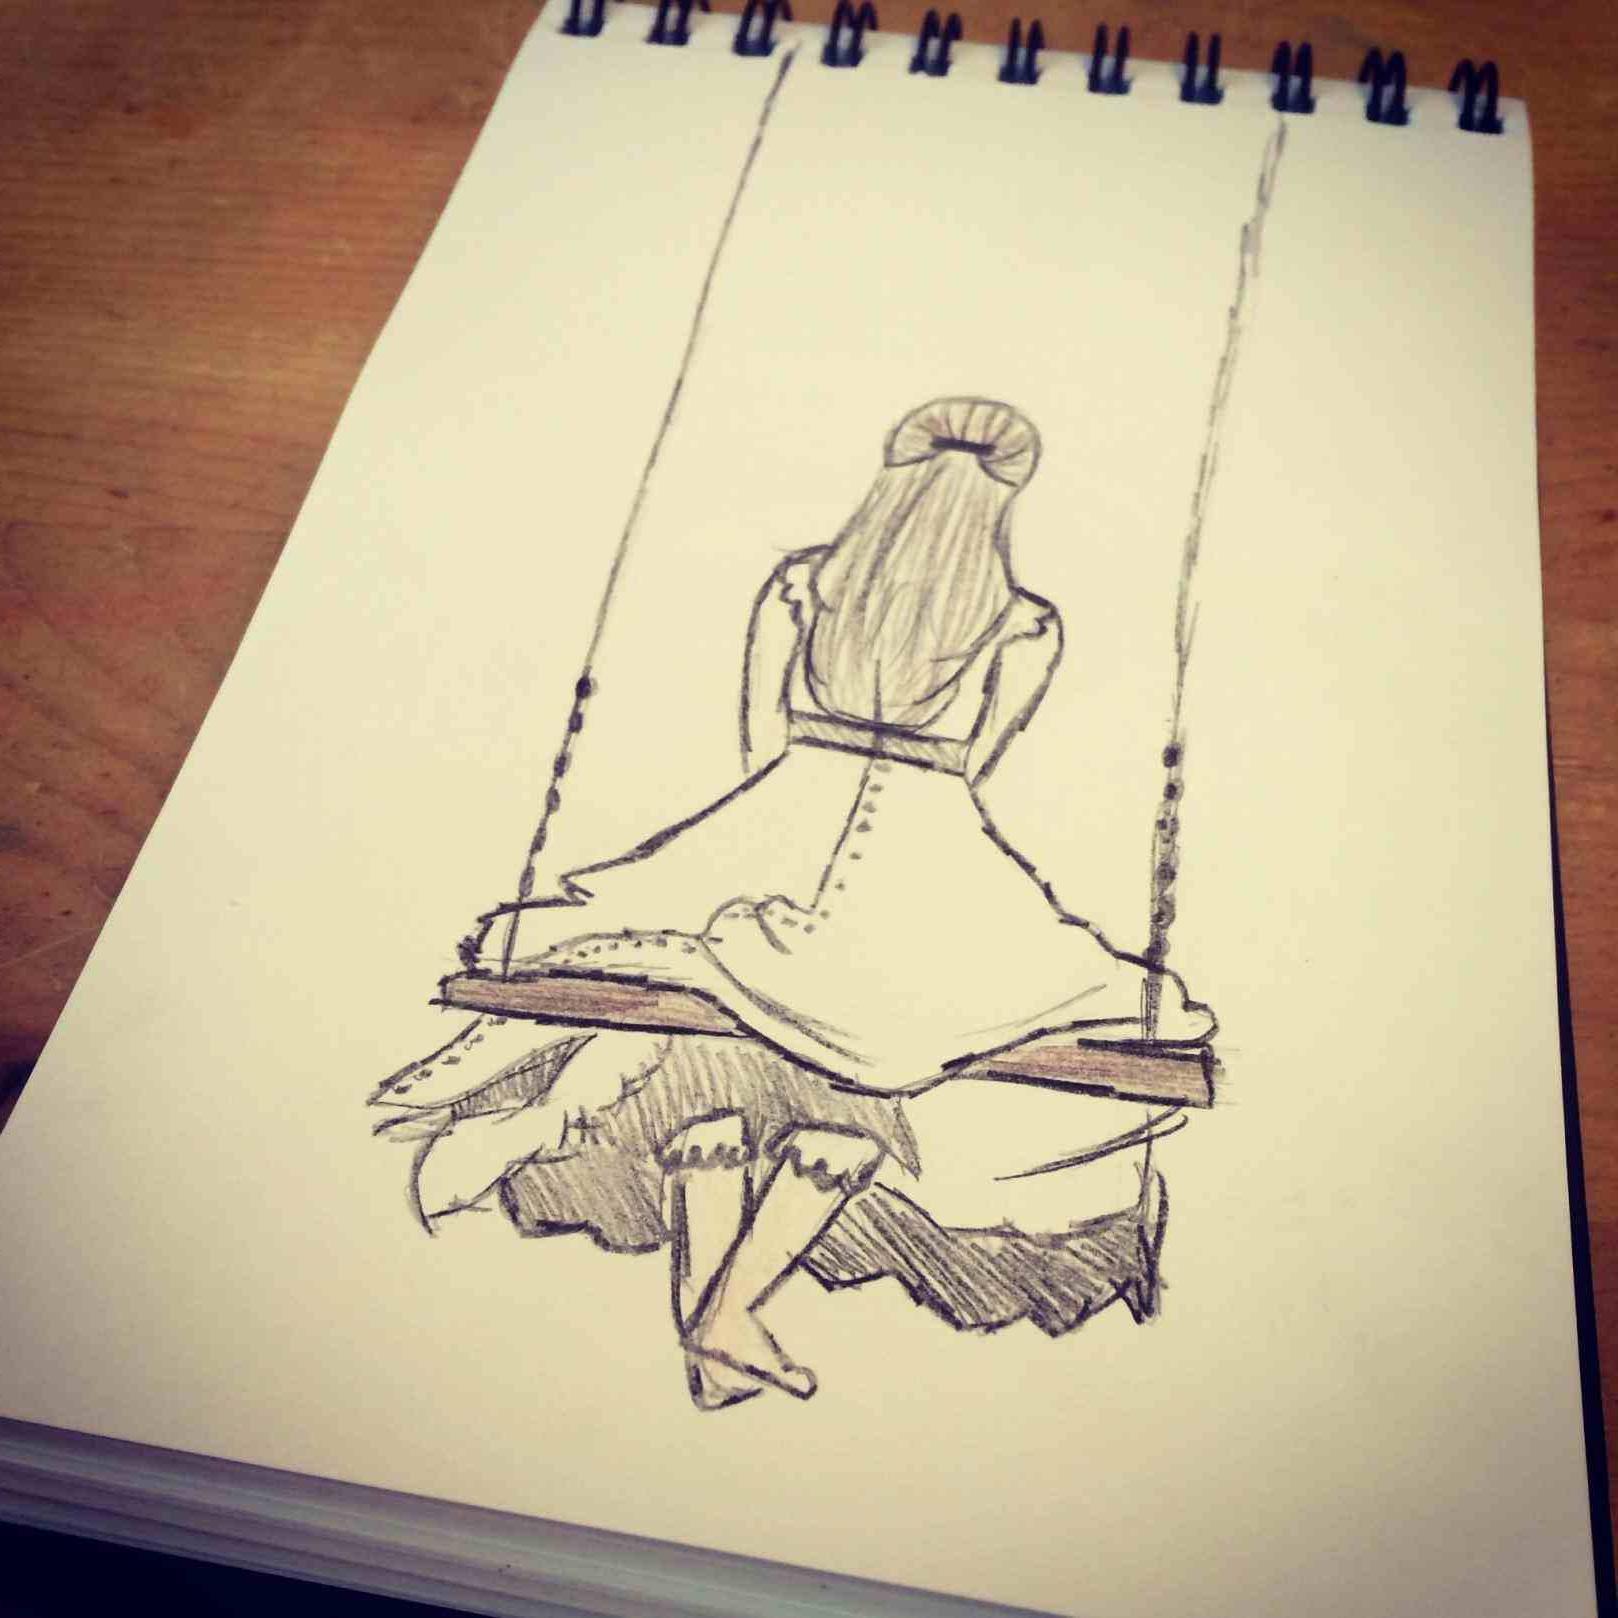 1618x1618 Cute Love Drawings Tumblr Cute Love Drawings For Your Boyfriend